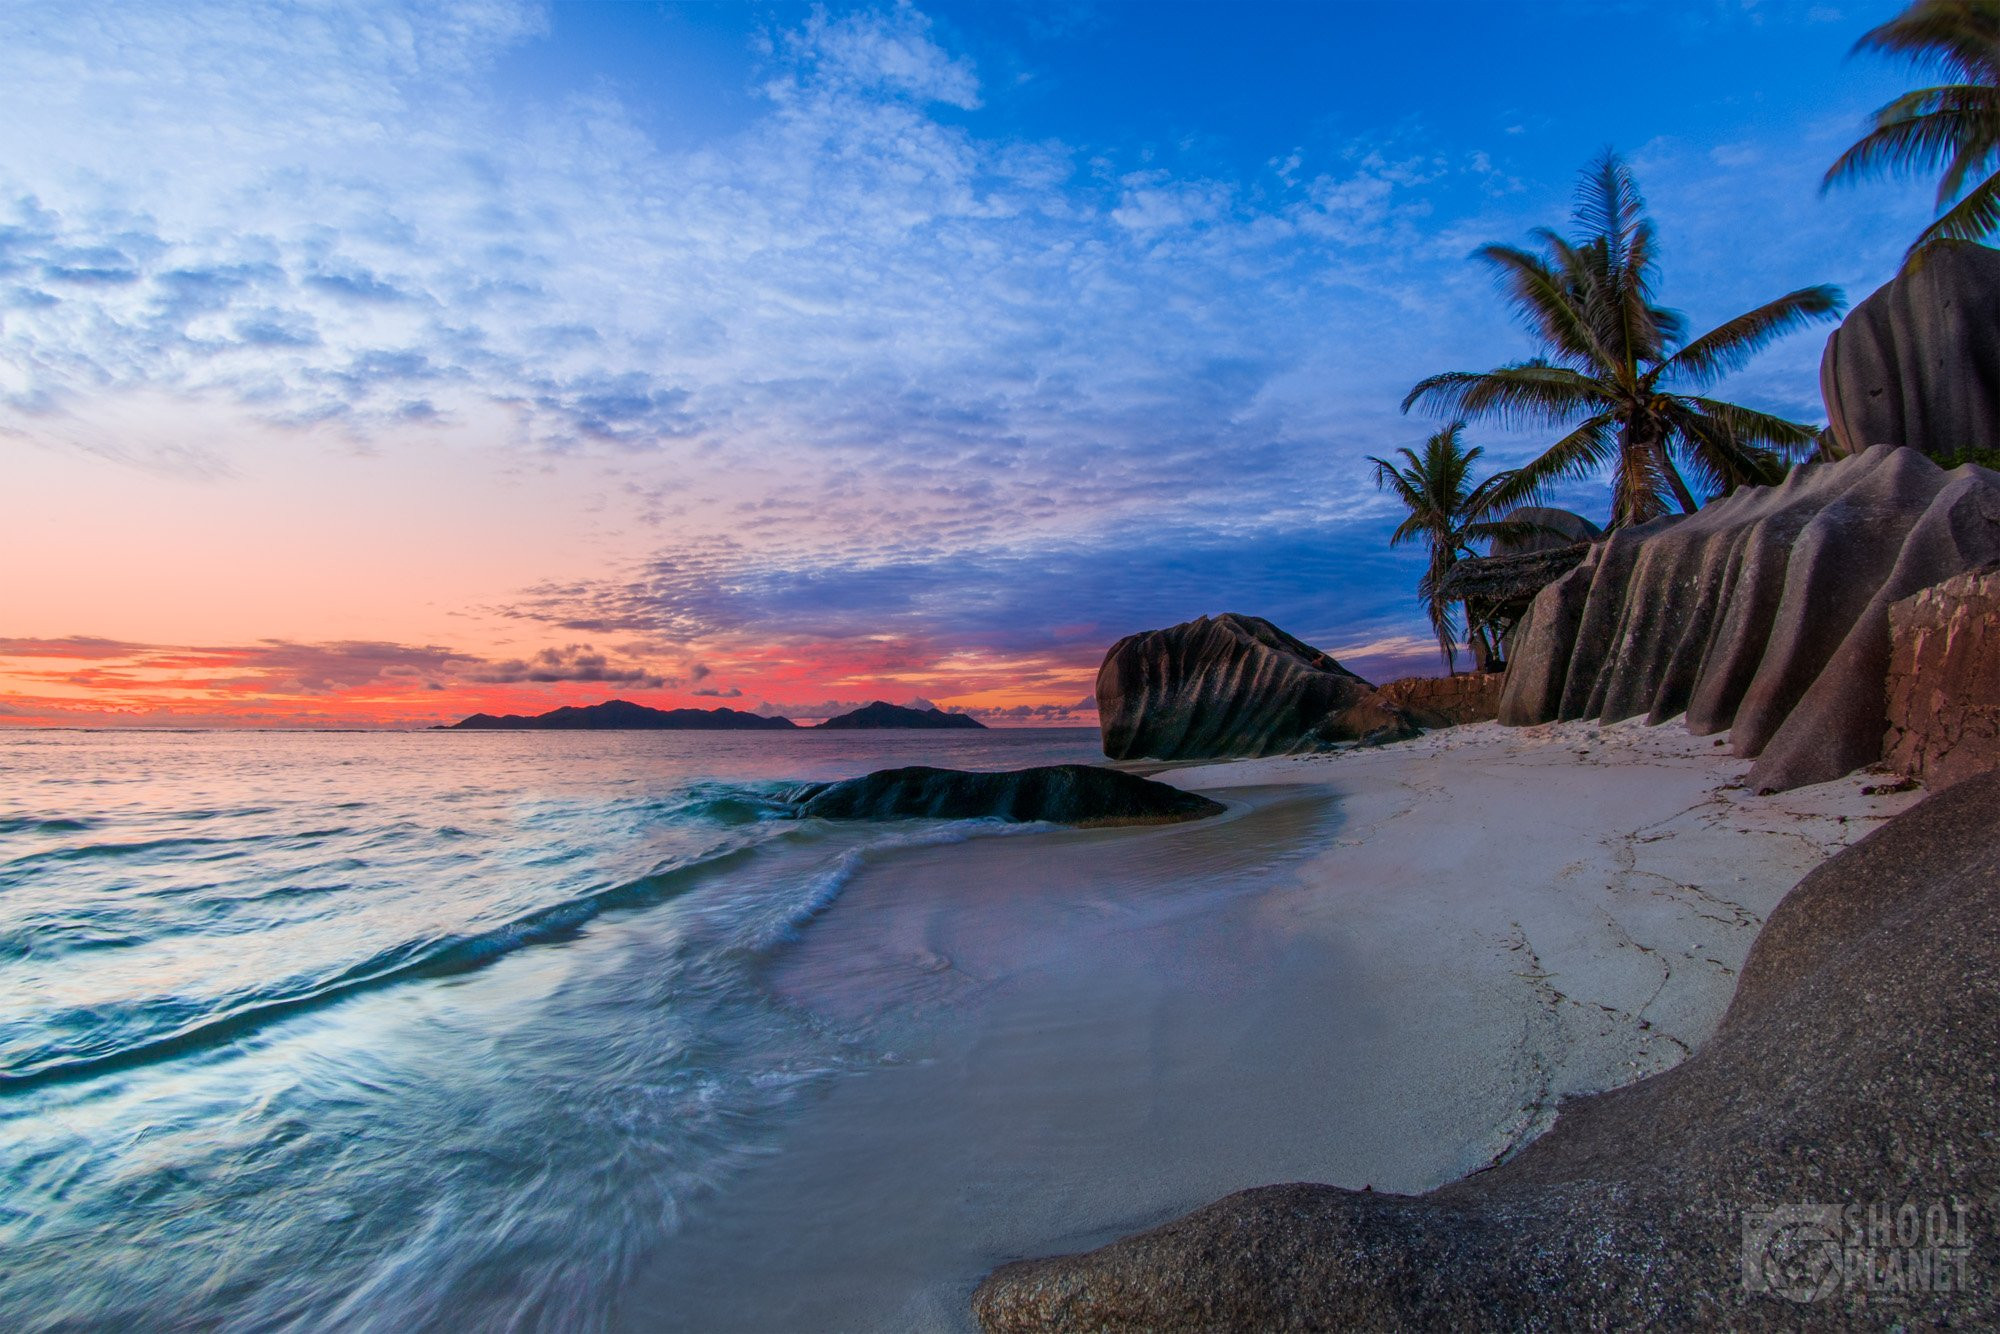 Beach and rocks sunrise, La Digue, Seychelles